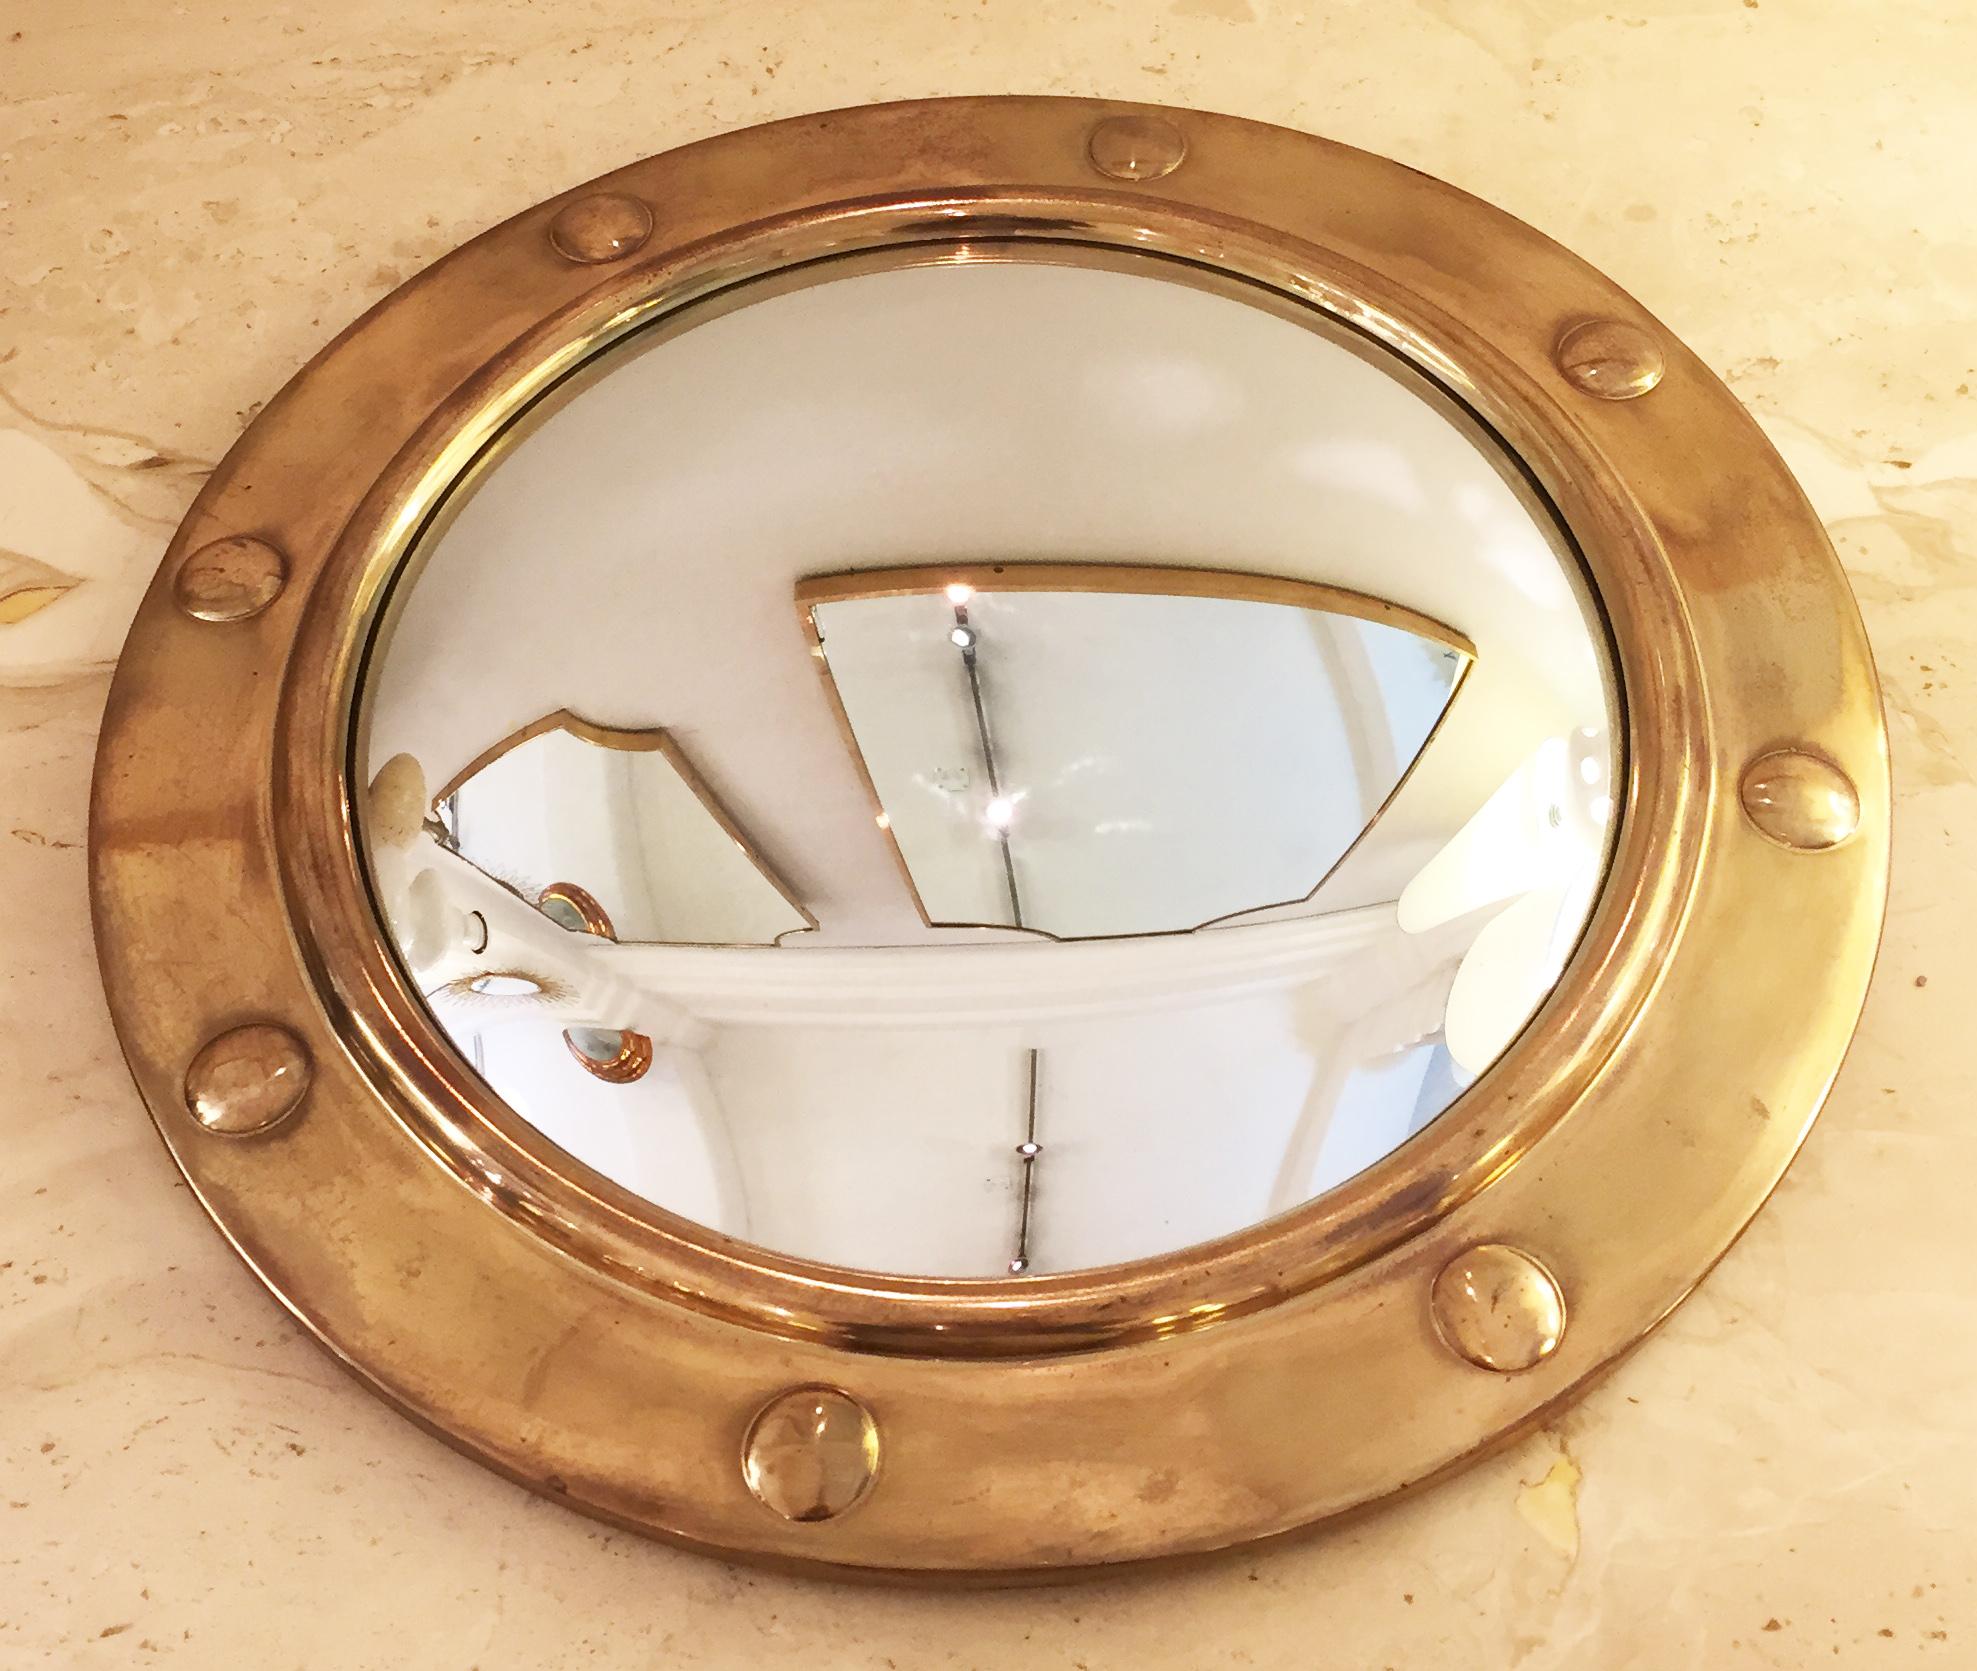 2nd miroir sorciere 2 a